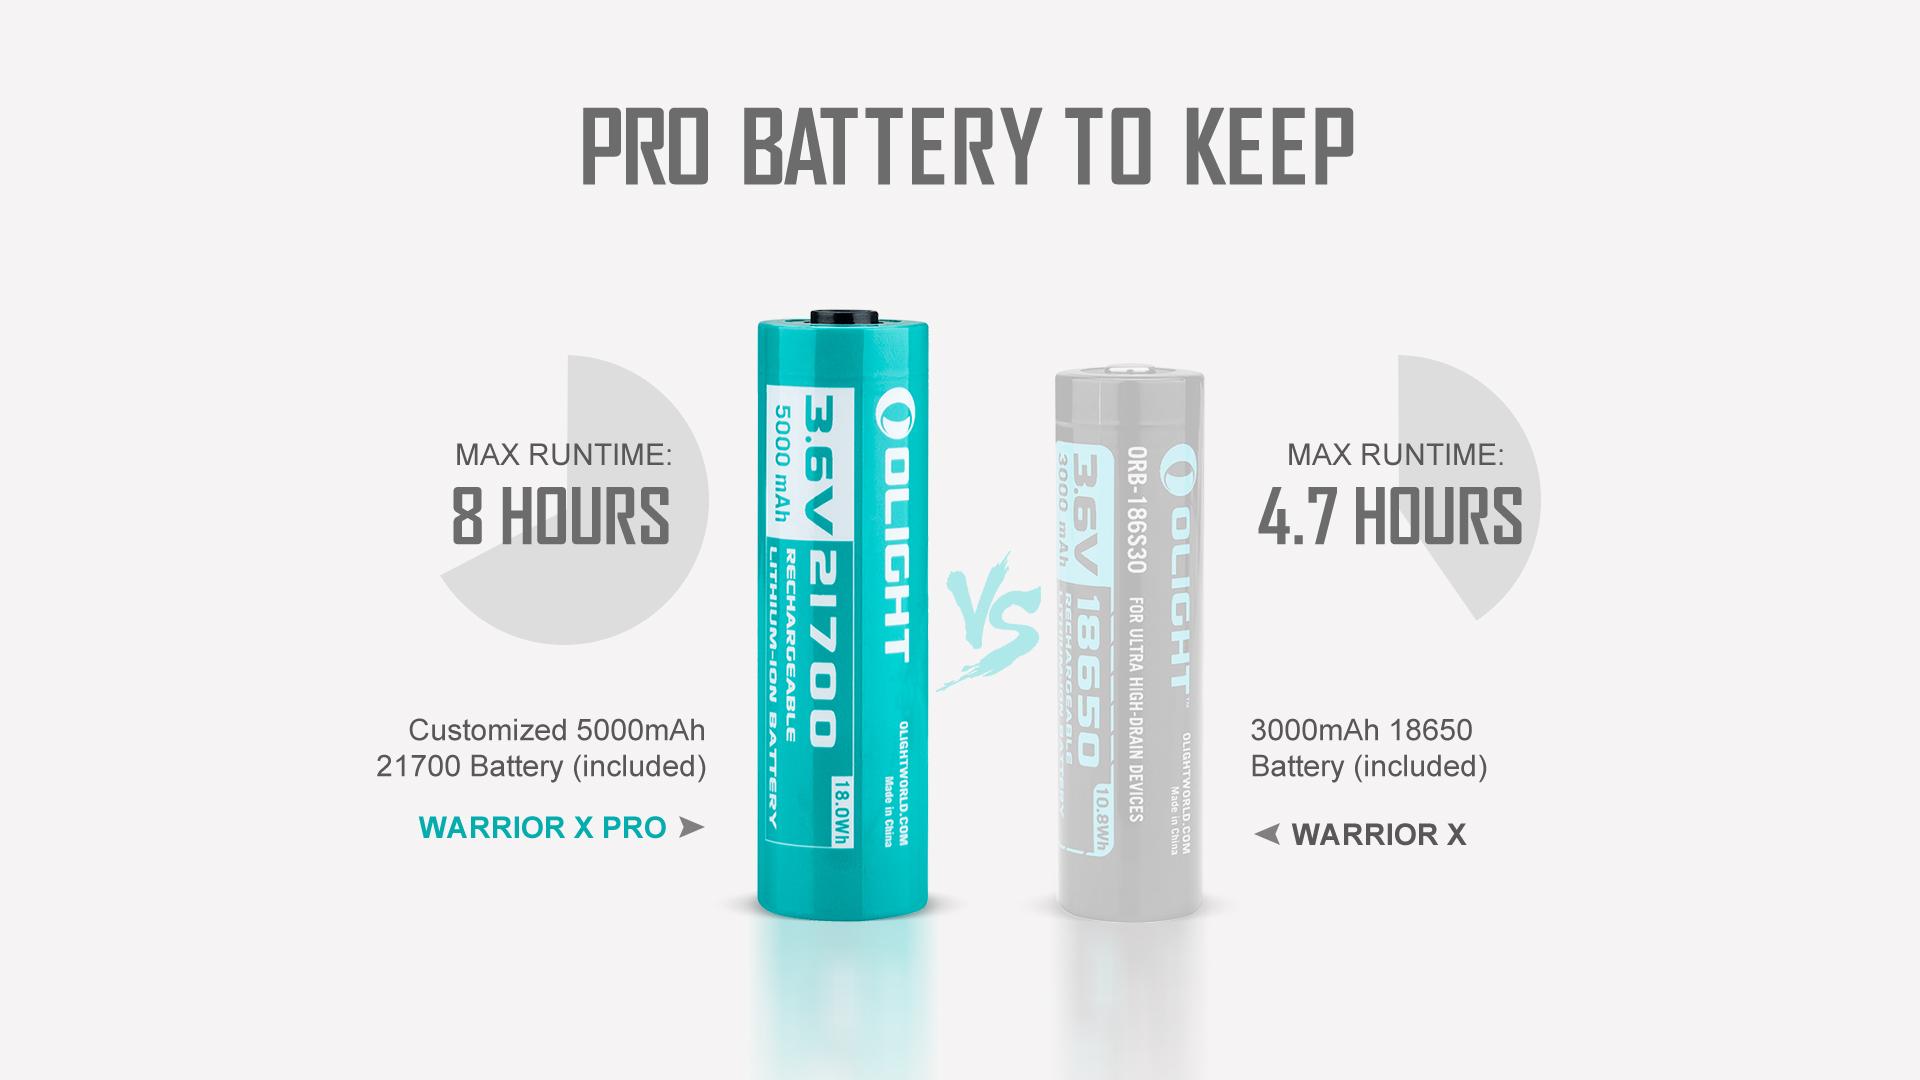 warrior X pro Higher-Capacity Battery